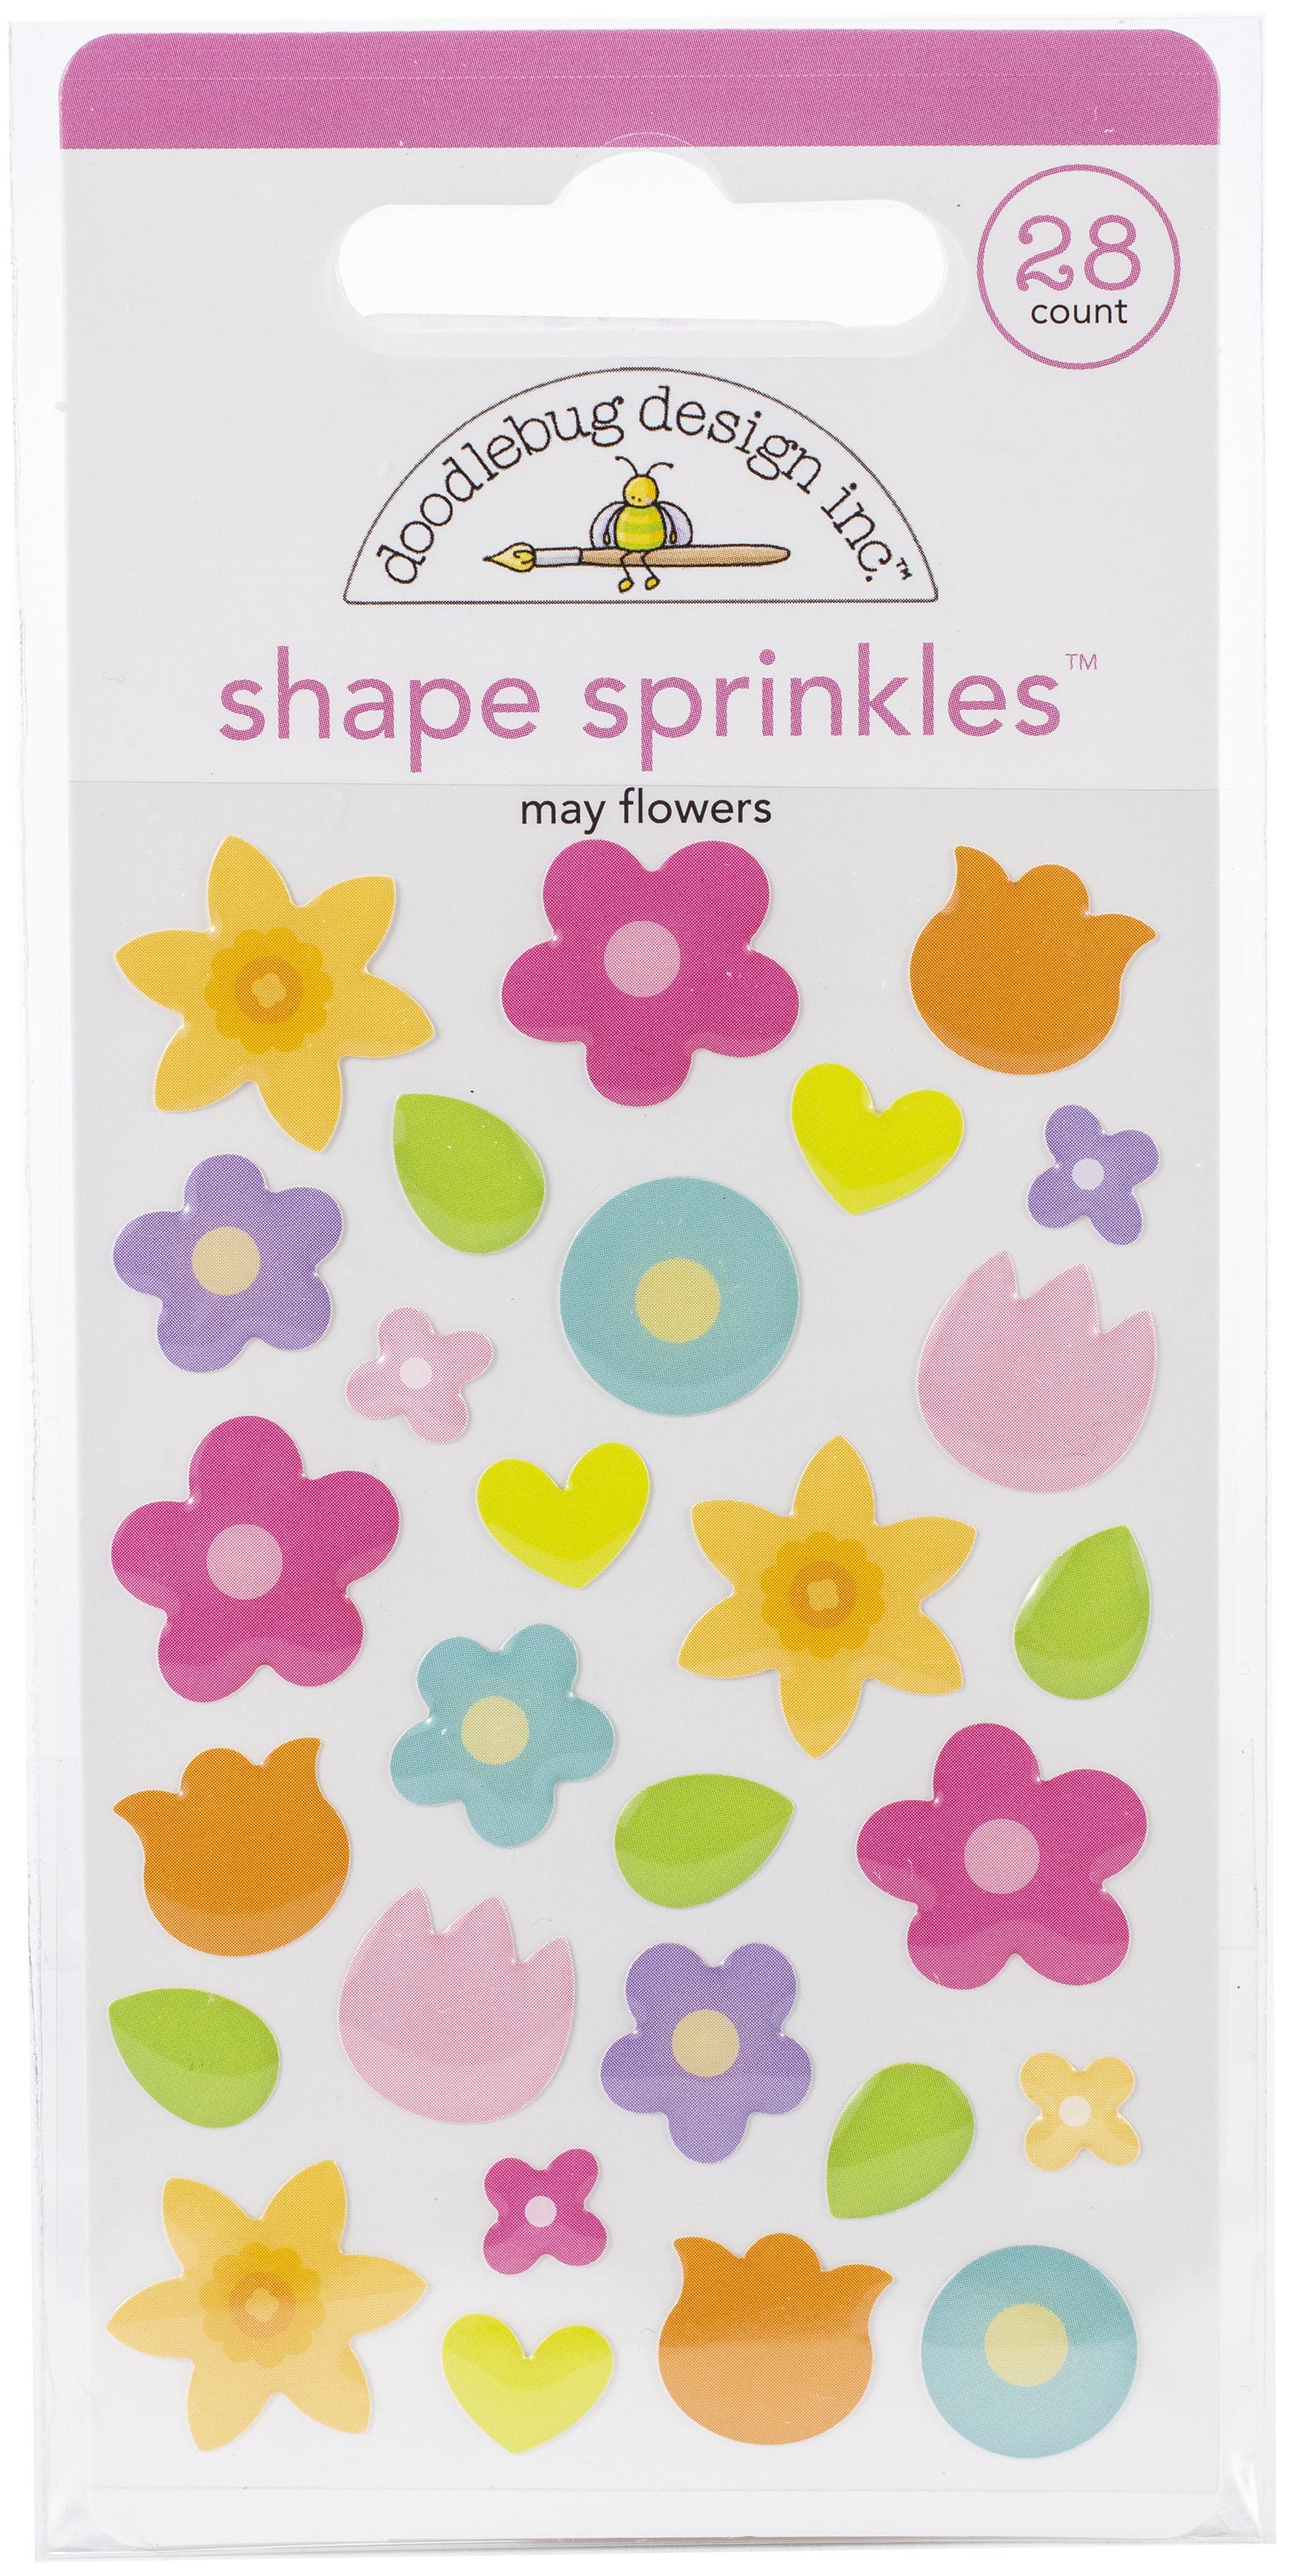 DB Hoppy Easter Sprinkles May Flowers